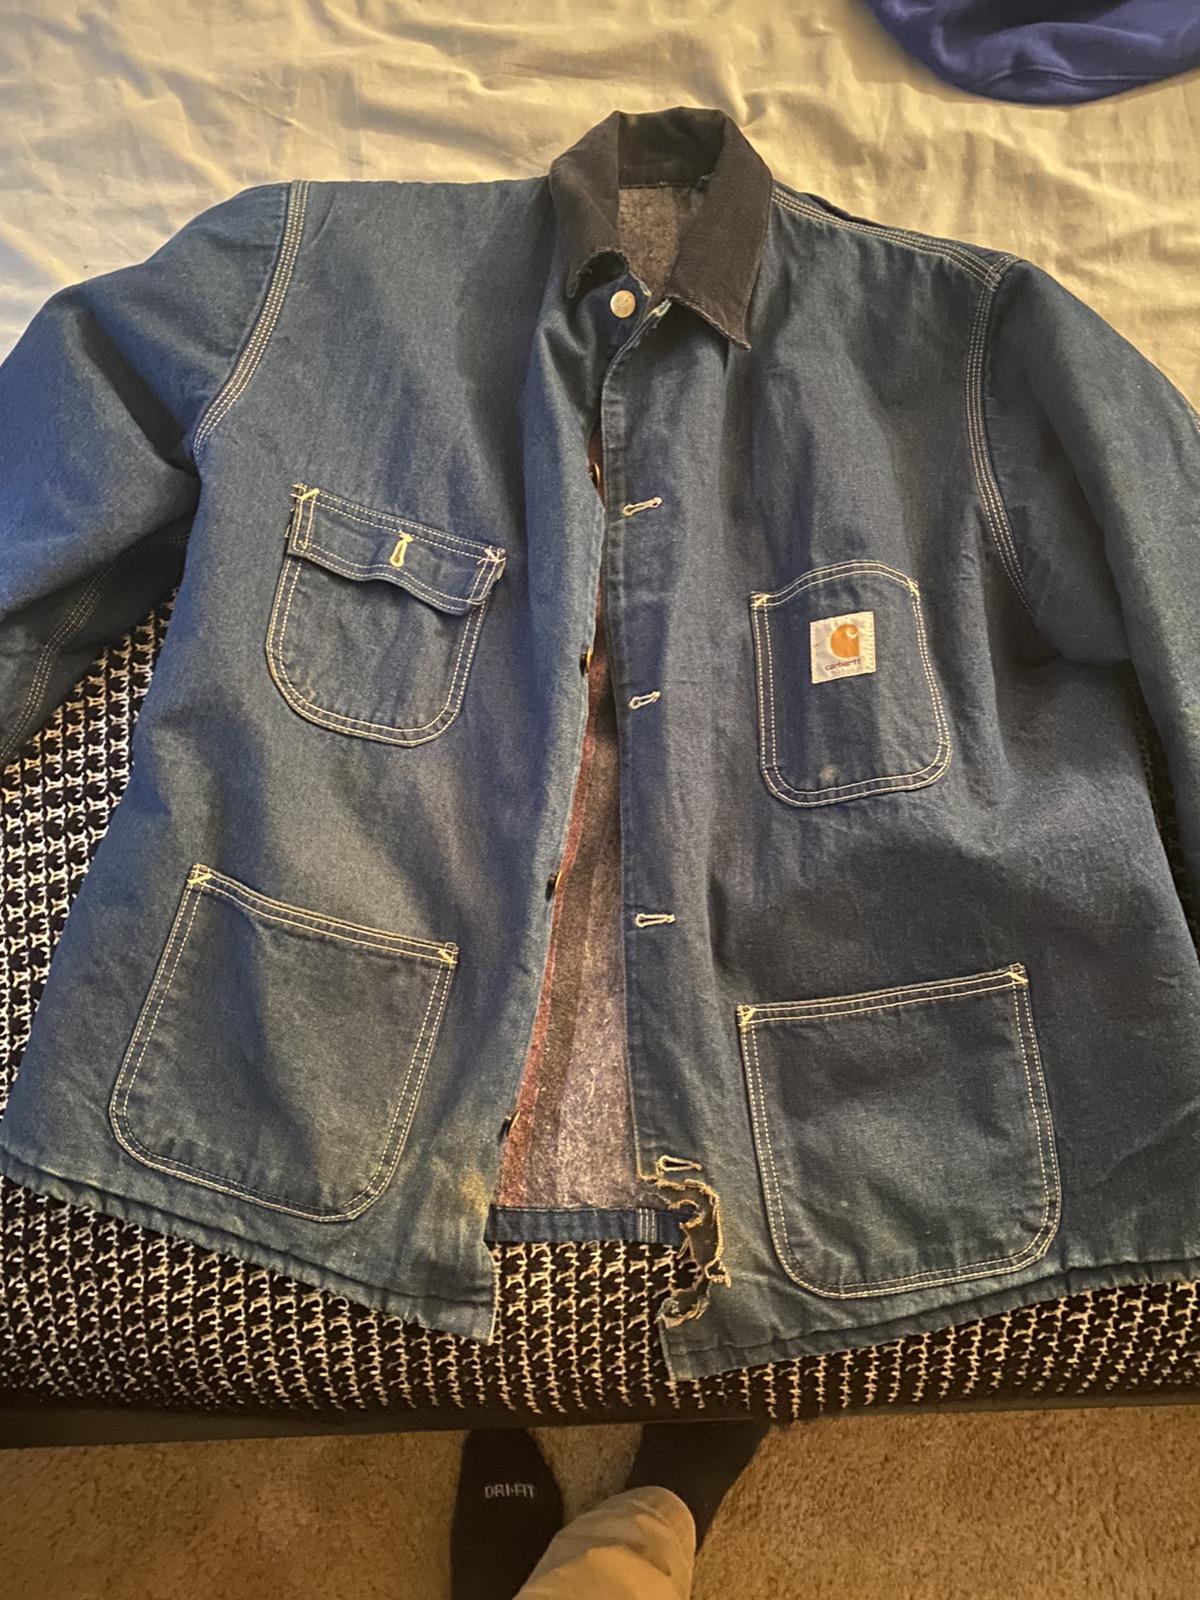 Rare Design Vintage Brand Carhartt Jacket Hoodie 1990s